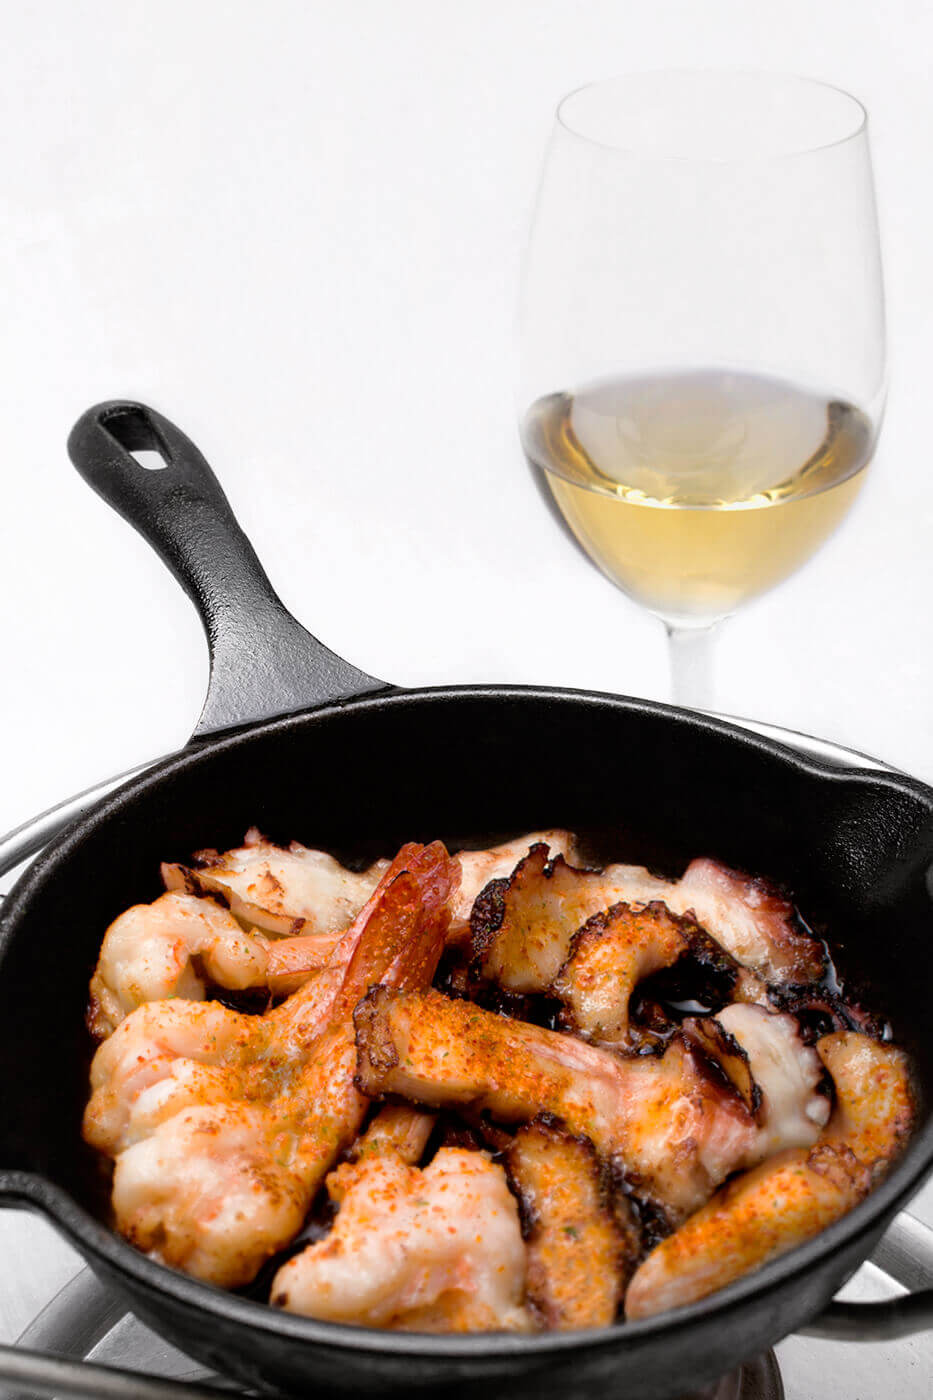 batayaki-mixto-y-vino-bodegas-salentein-reserva-chardonnay-argentina